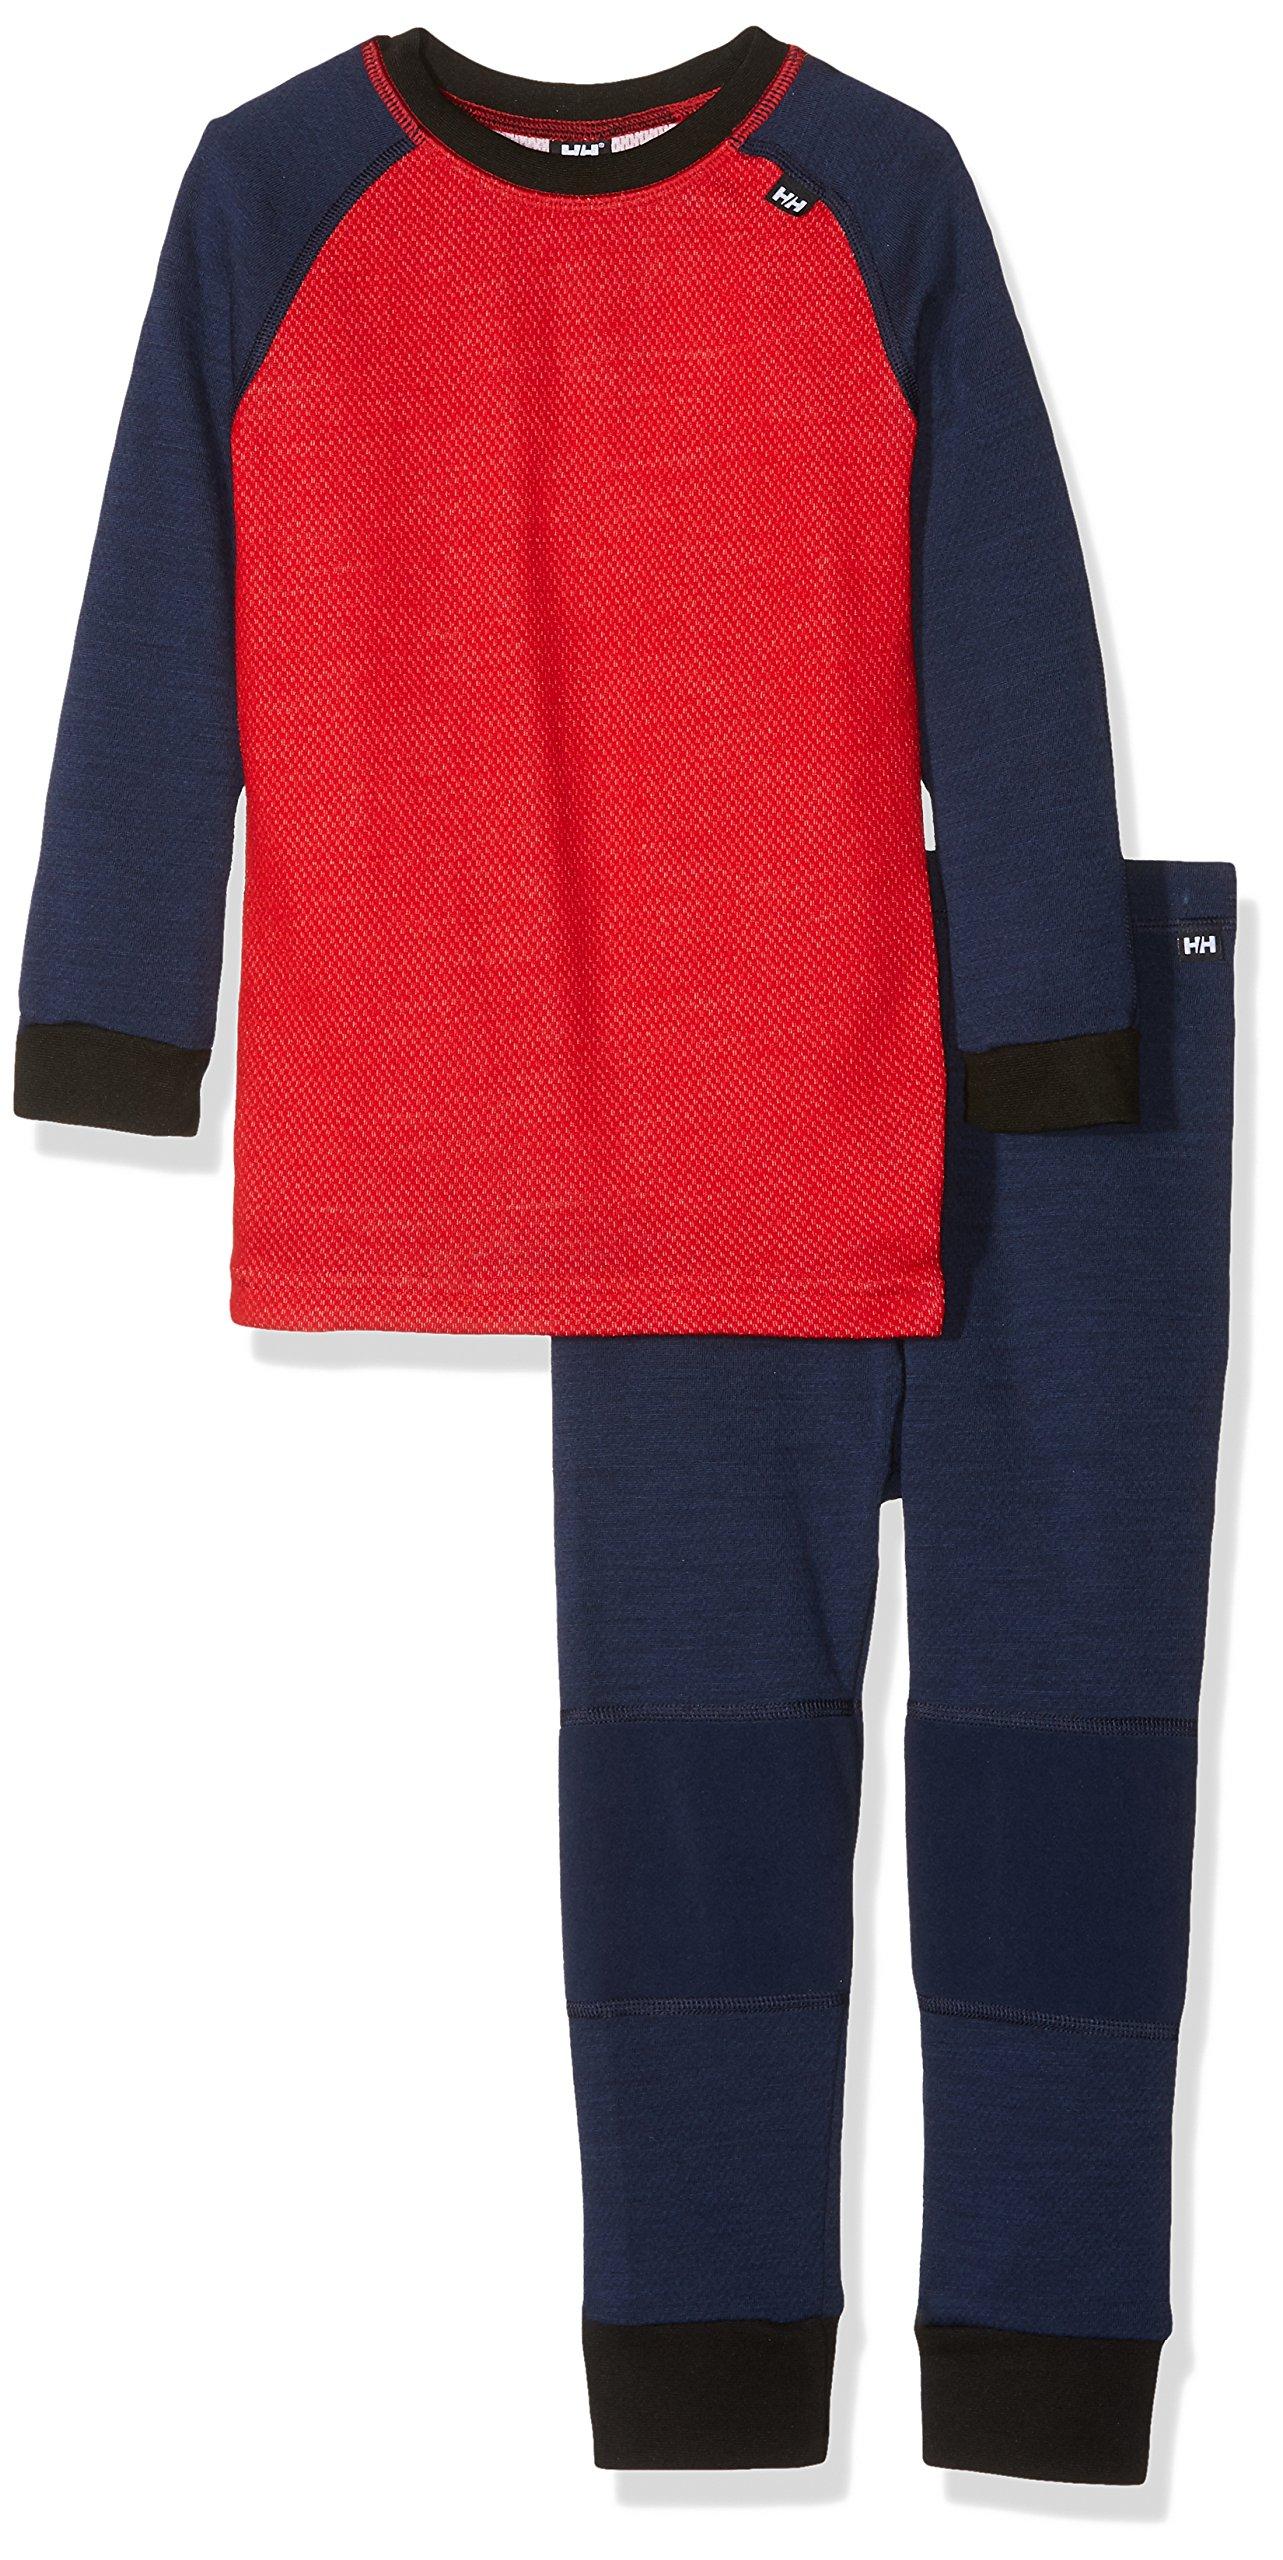 Helly Hansen Kids LIFA Merino Wool Warm Baselayer Set Top and Bottom, 691 Evening Blue/Alert Red, Size 2